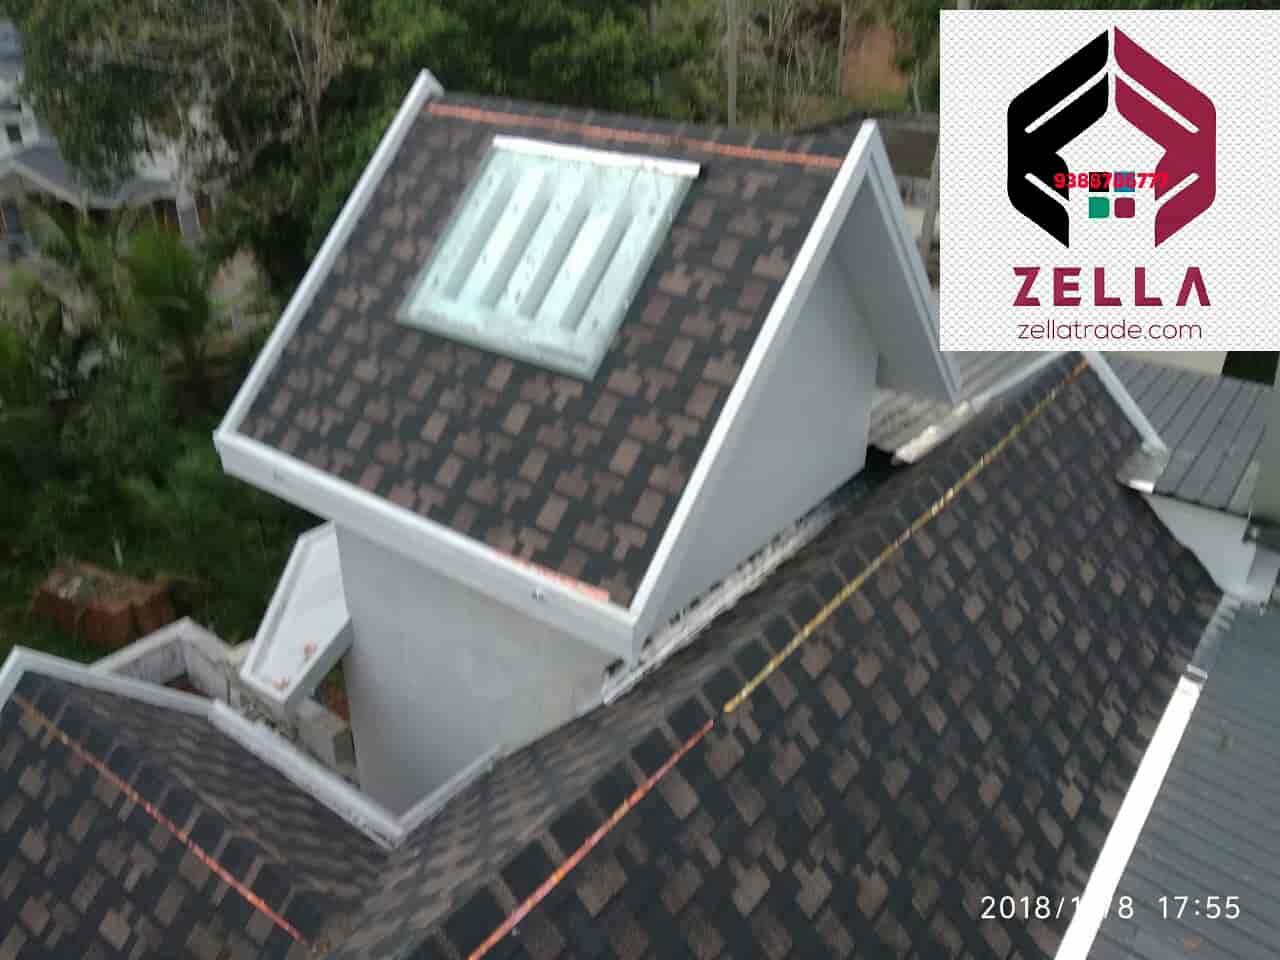 Zella roofing shingles, Thamarassery - Roofing Sheet Dealers